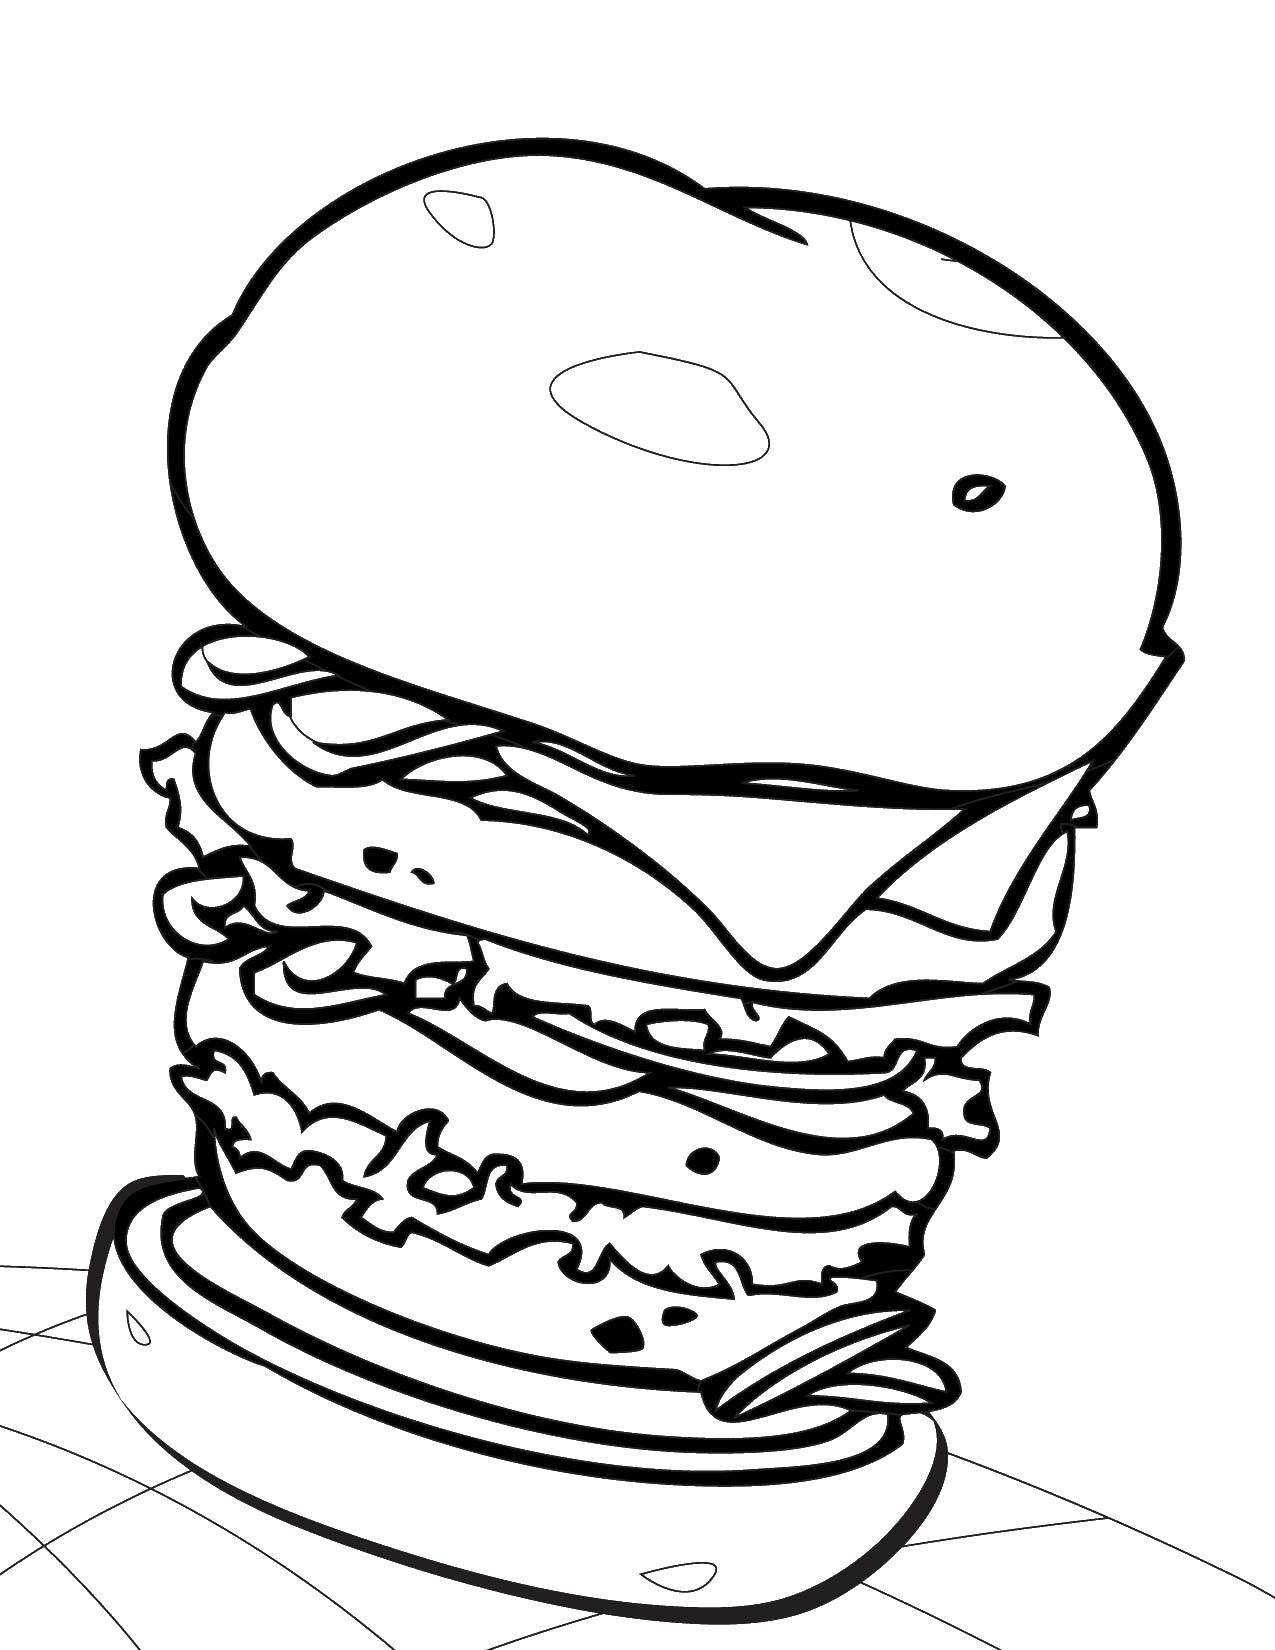 картинки гамбургера раскраска орнаментал эскизы фото